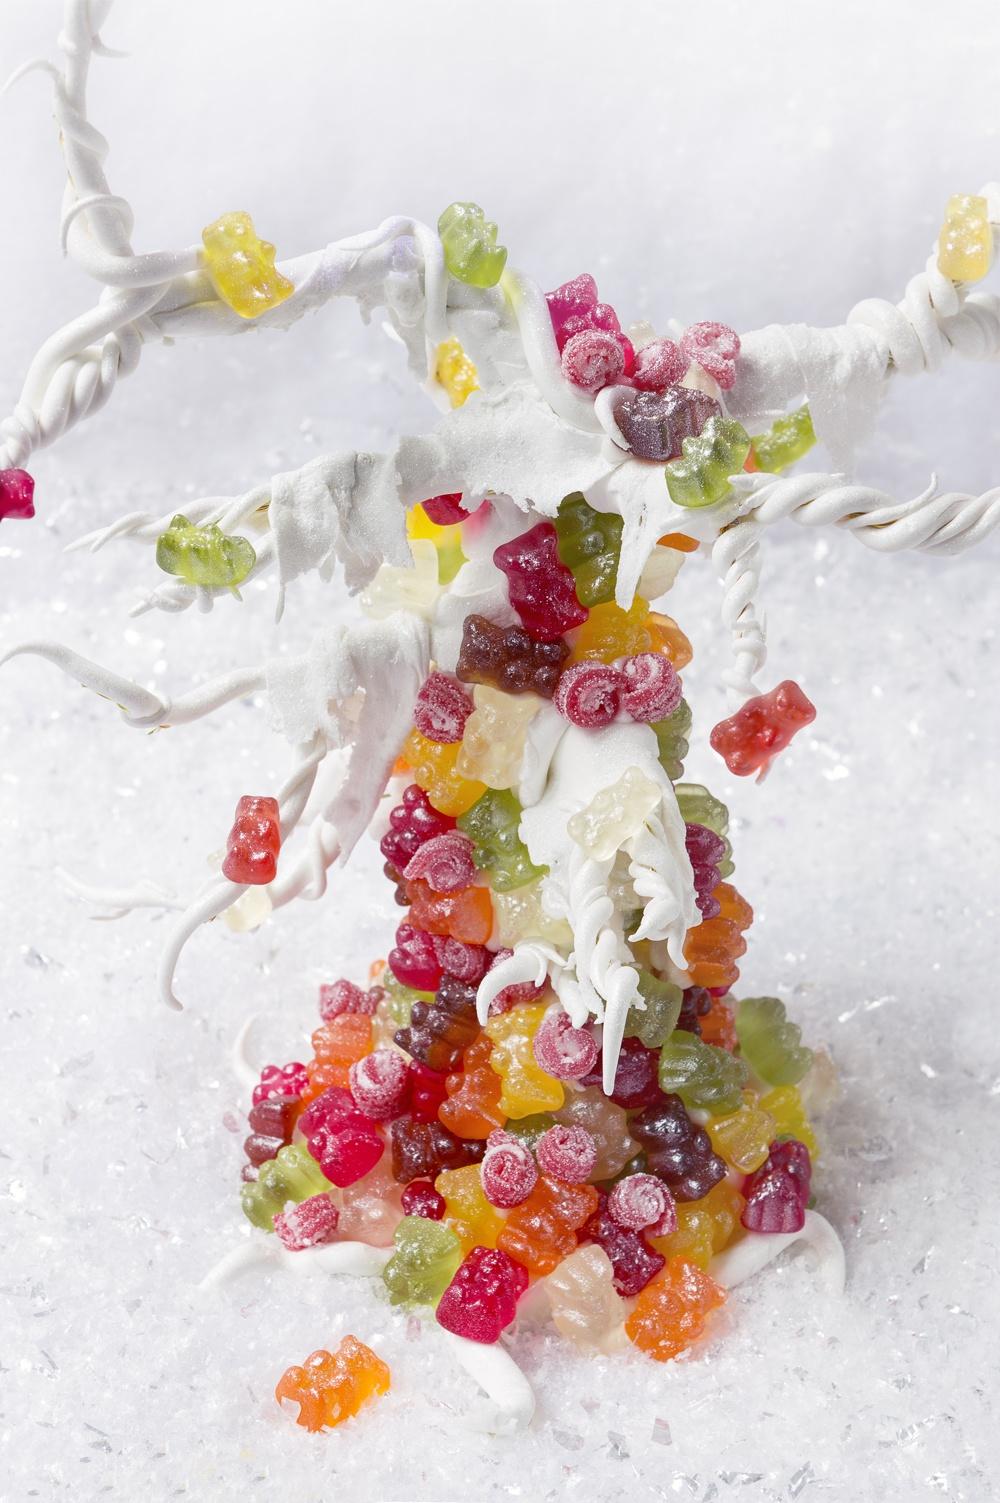 L'arbre à bonbons - Candy Tree - Studio de création - Qui a vole les tartes (2)